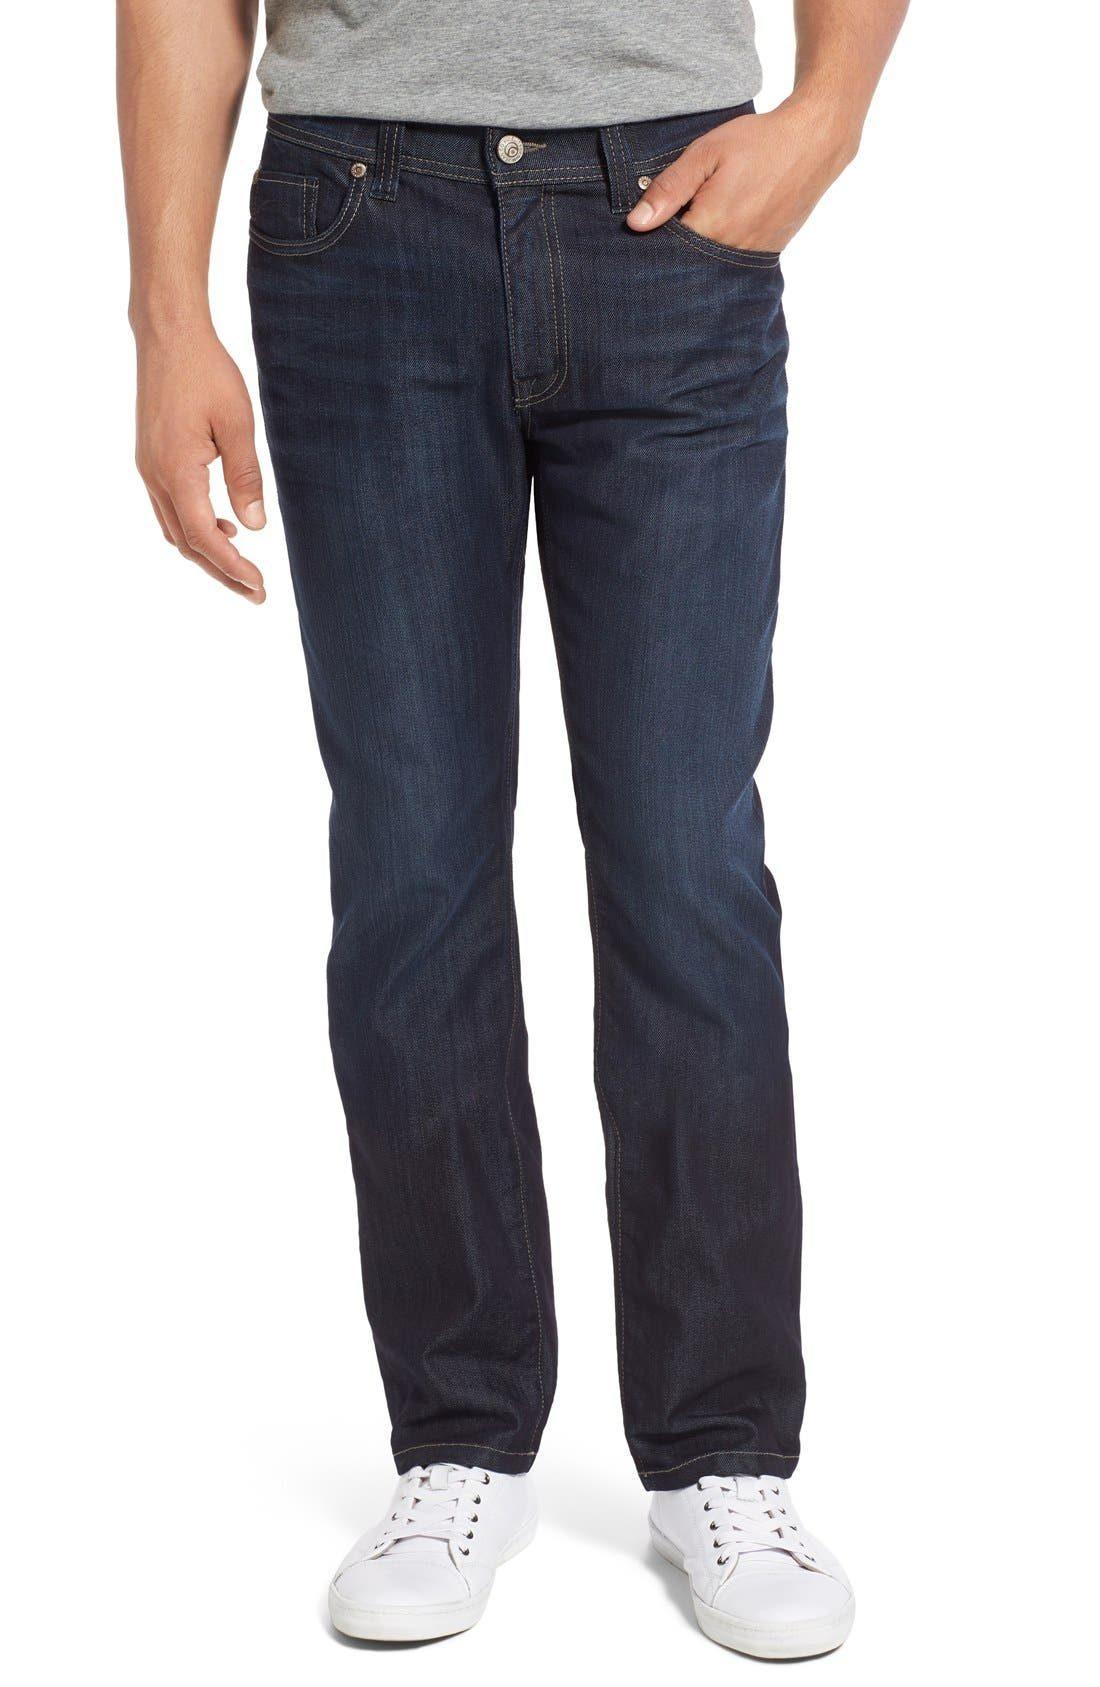 FIDELITY DENIM 'Jimmy' Slim Straight Jeans